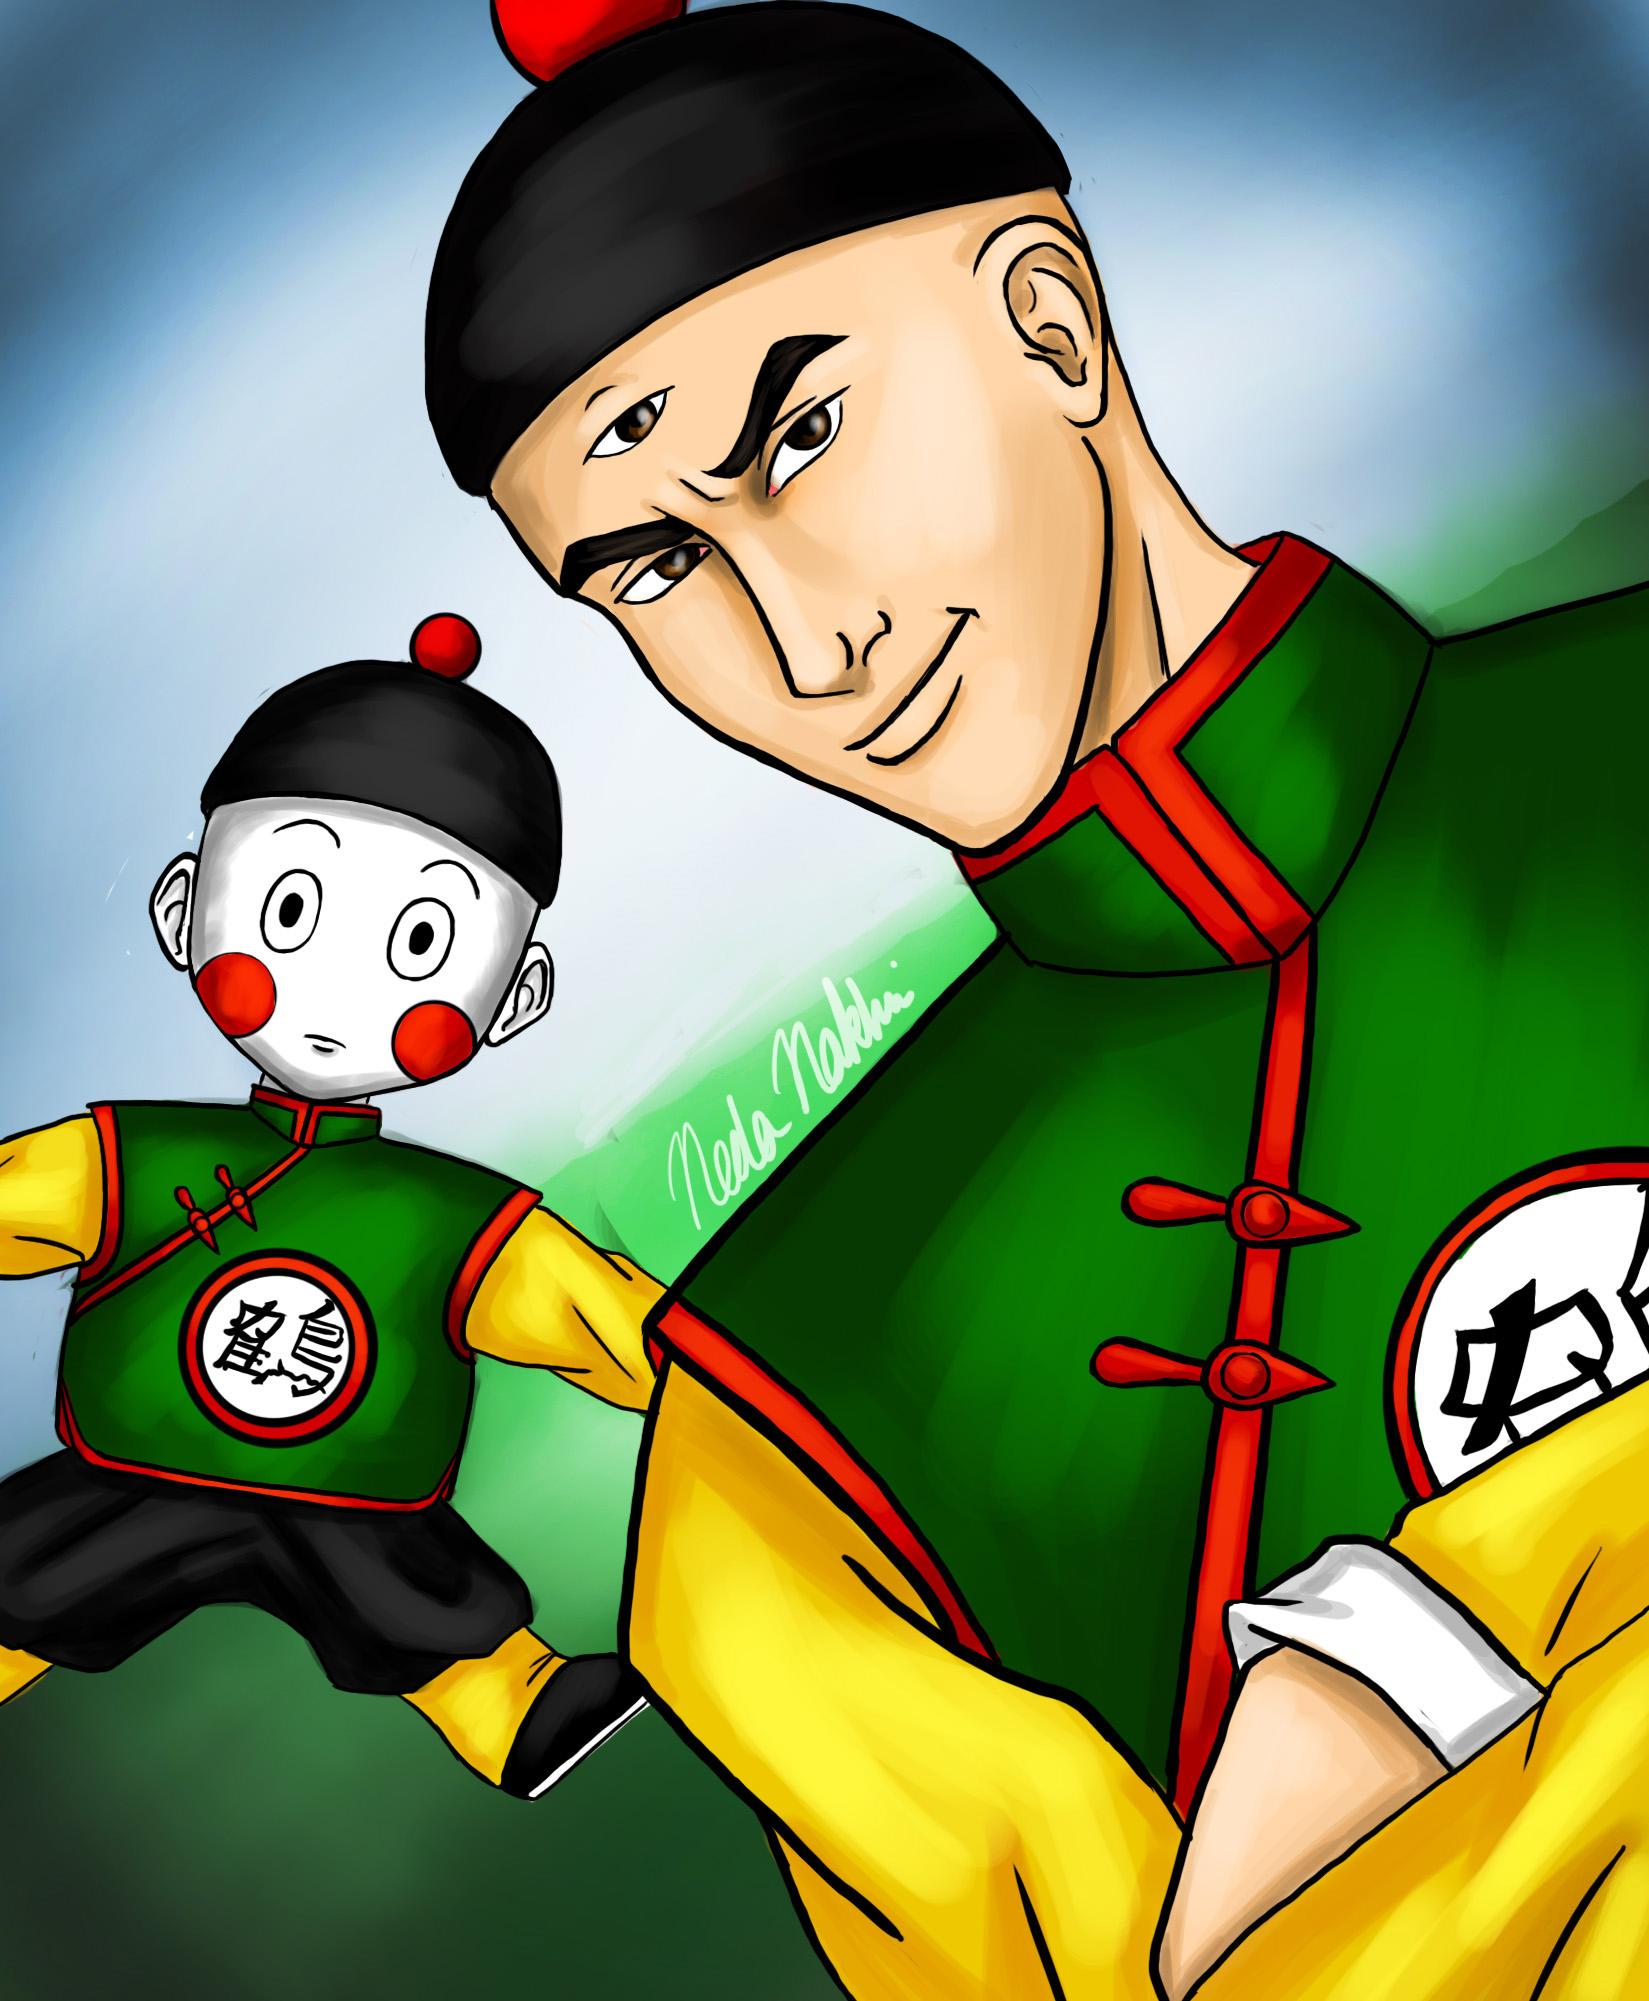 Tien Shinhan And Chiaotzu By Majinneda On Deviantart